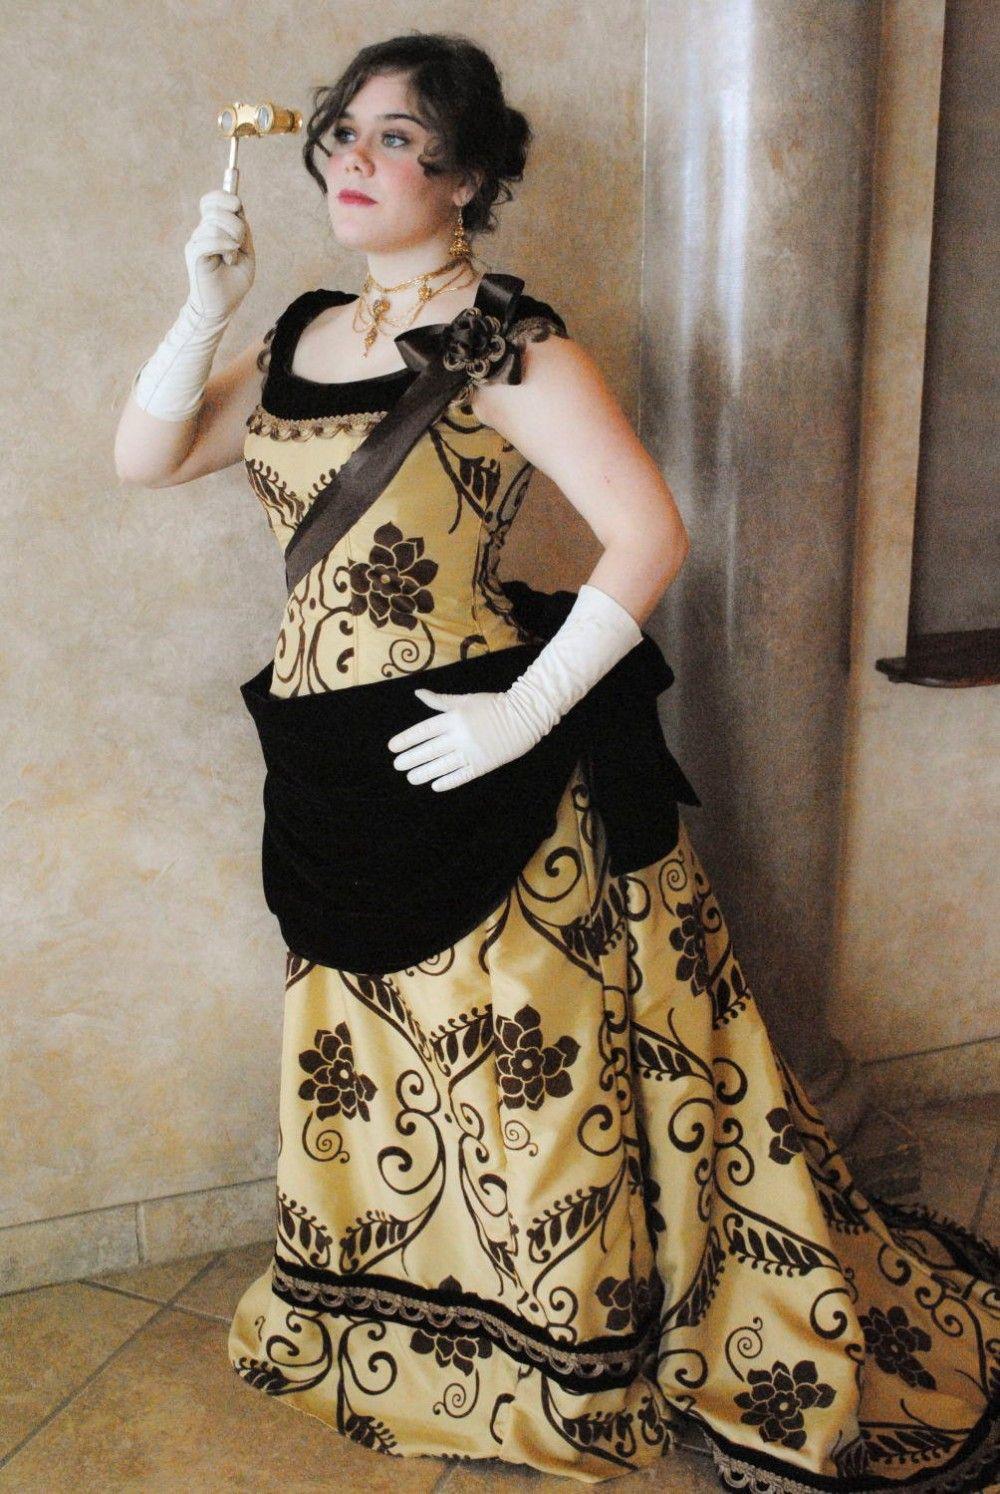 plus size renaissance fair costumes steampunk wedding dresses 8 best images about Plus size renaissance fair costumes on Pinterest Dress skirt Plus size fashion and Halloween costumes